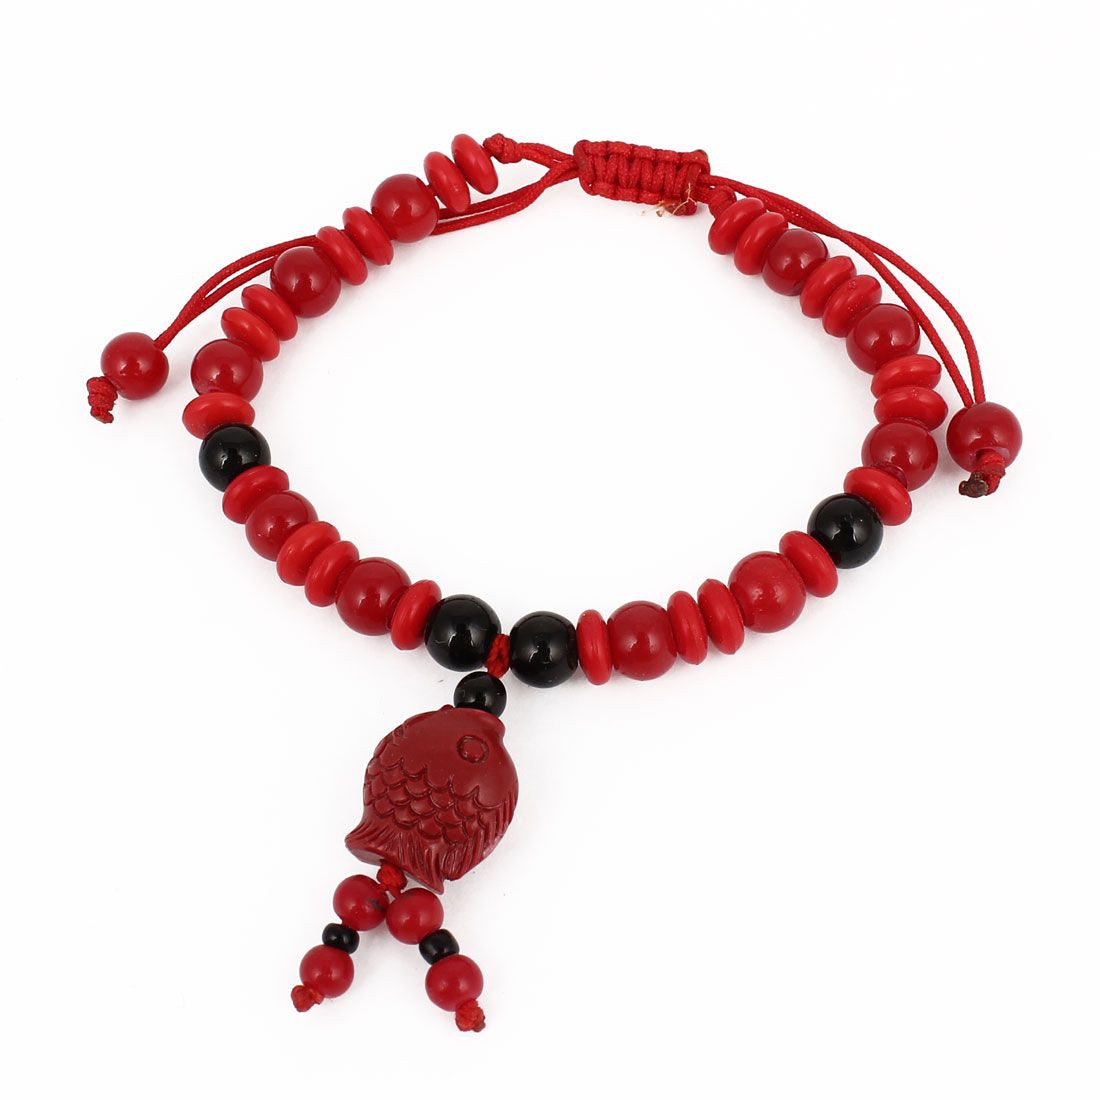 Plastic Carved Fish Decor Black Red Beads Chain Draw Nylon String Bracelet